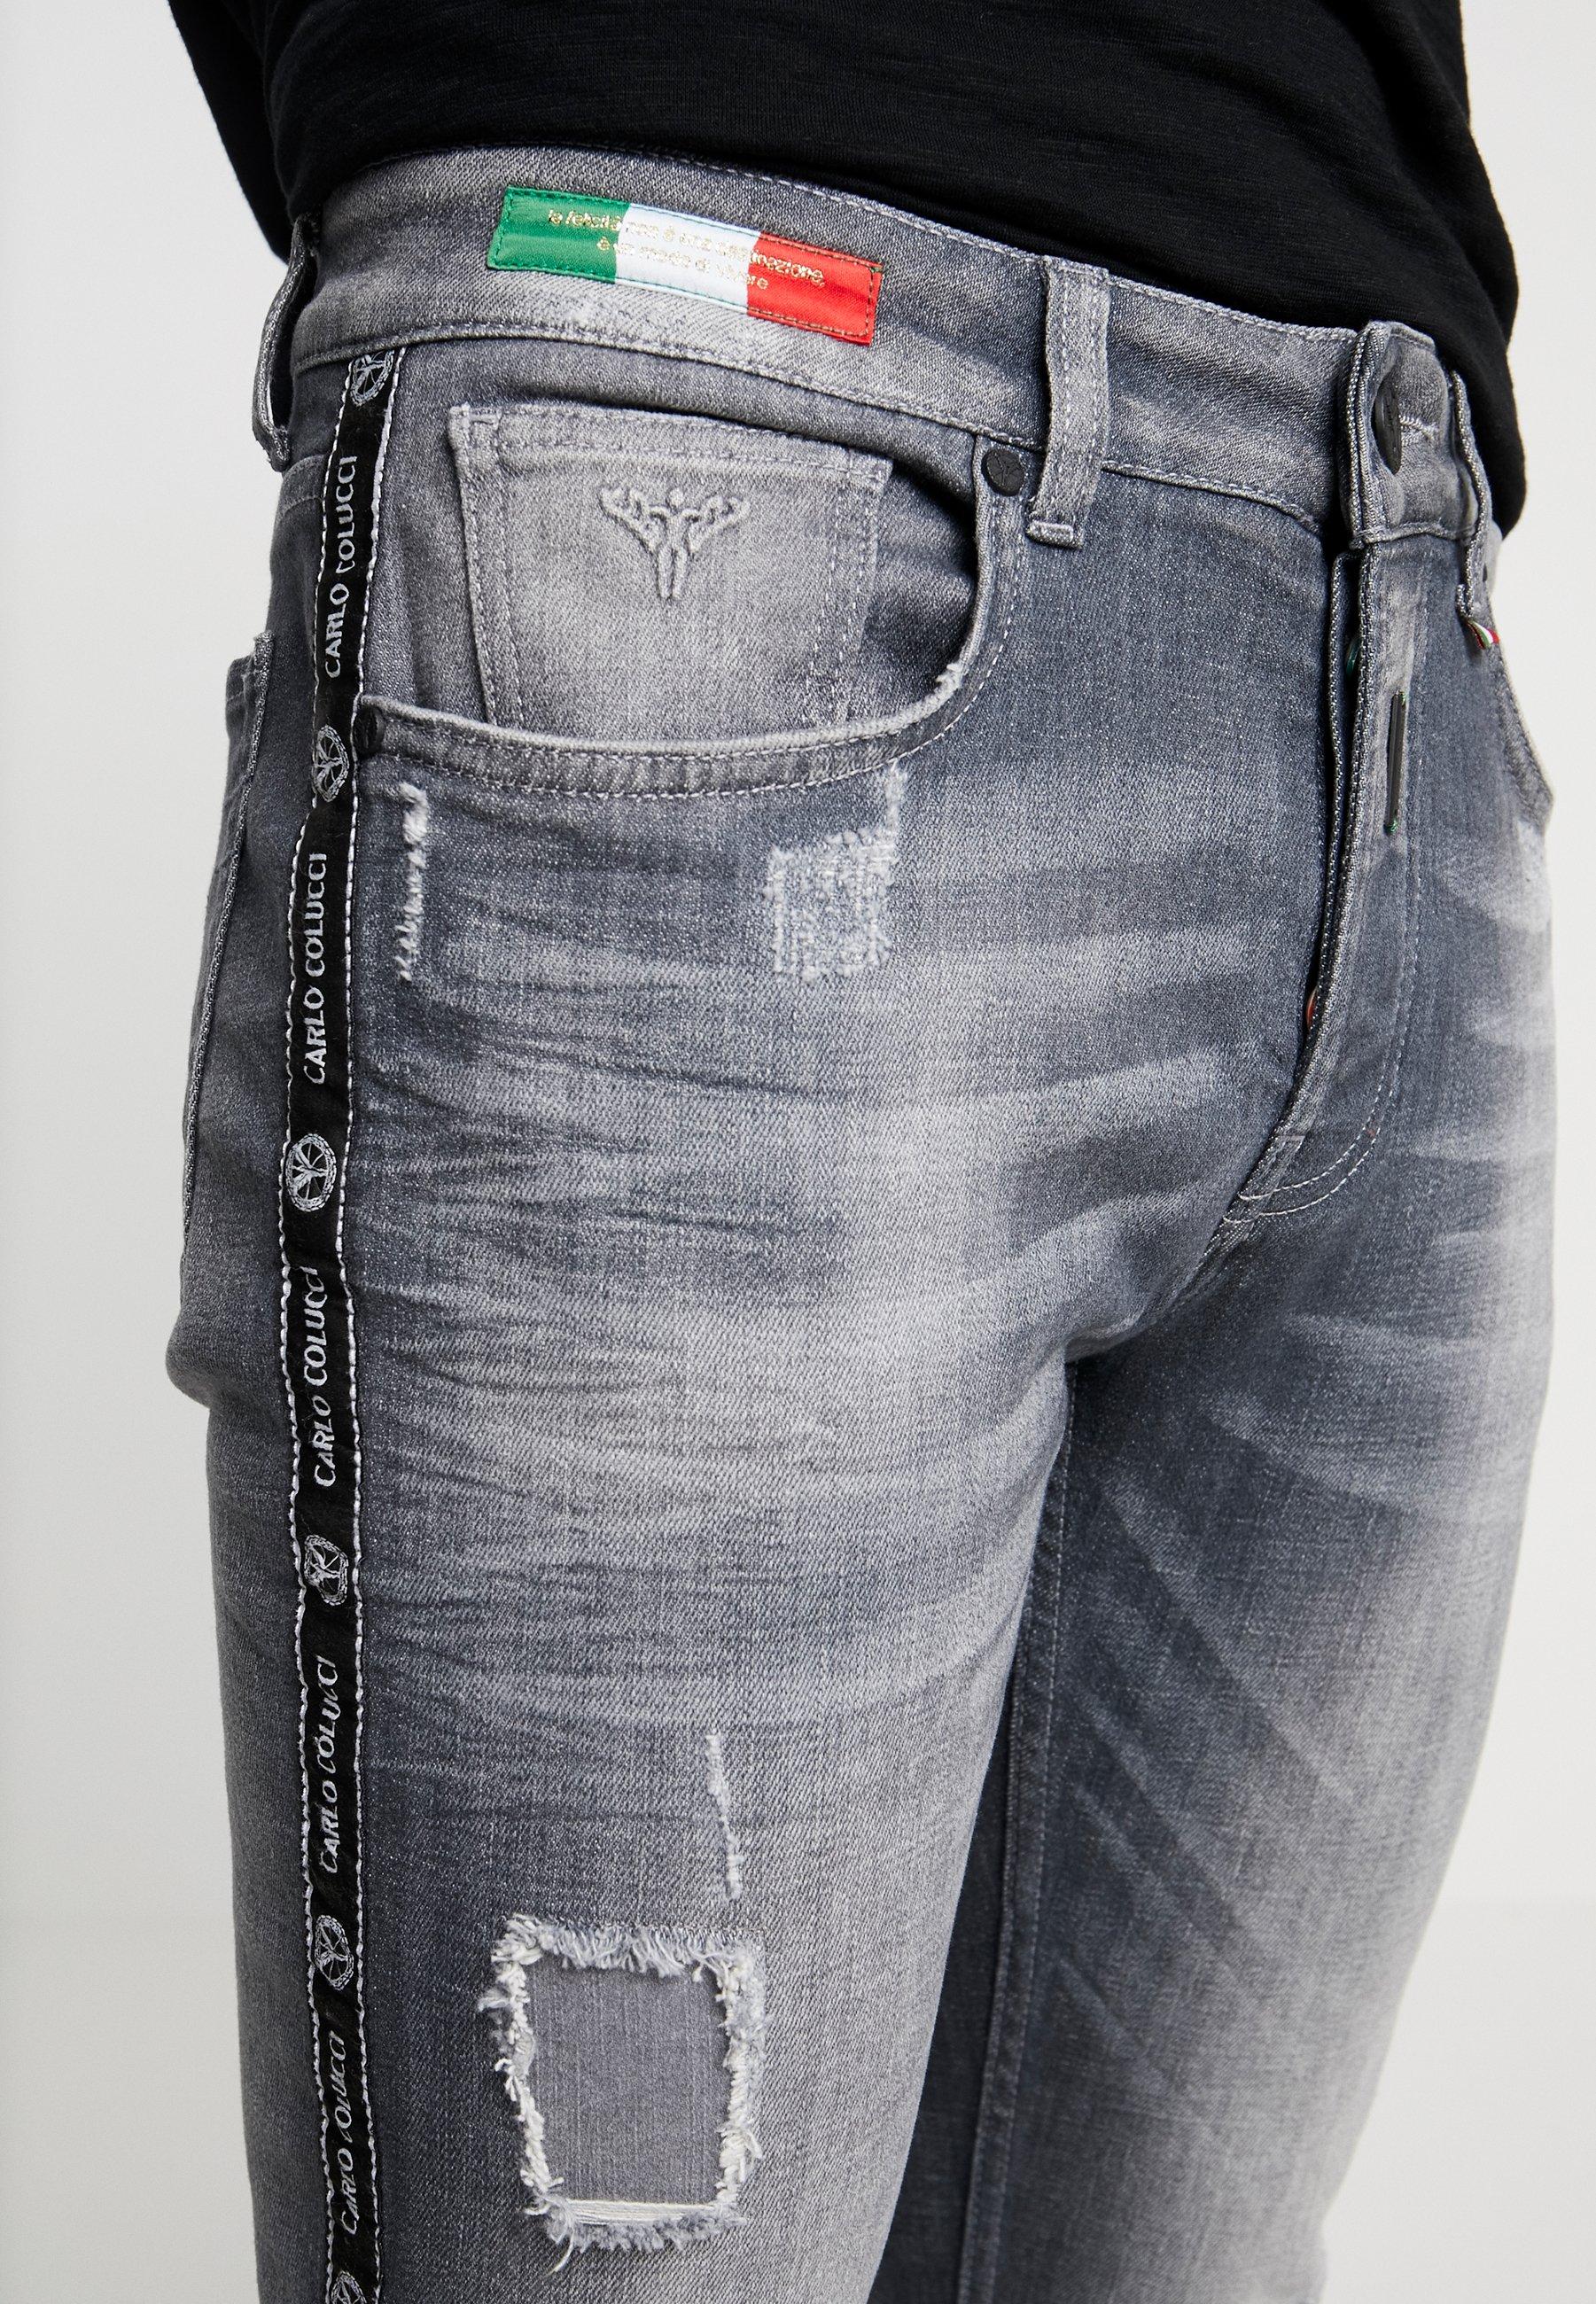 Carlo Colucci Slim Fit Jeans Grey wZPWa958 kDooyAV7